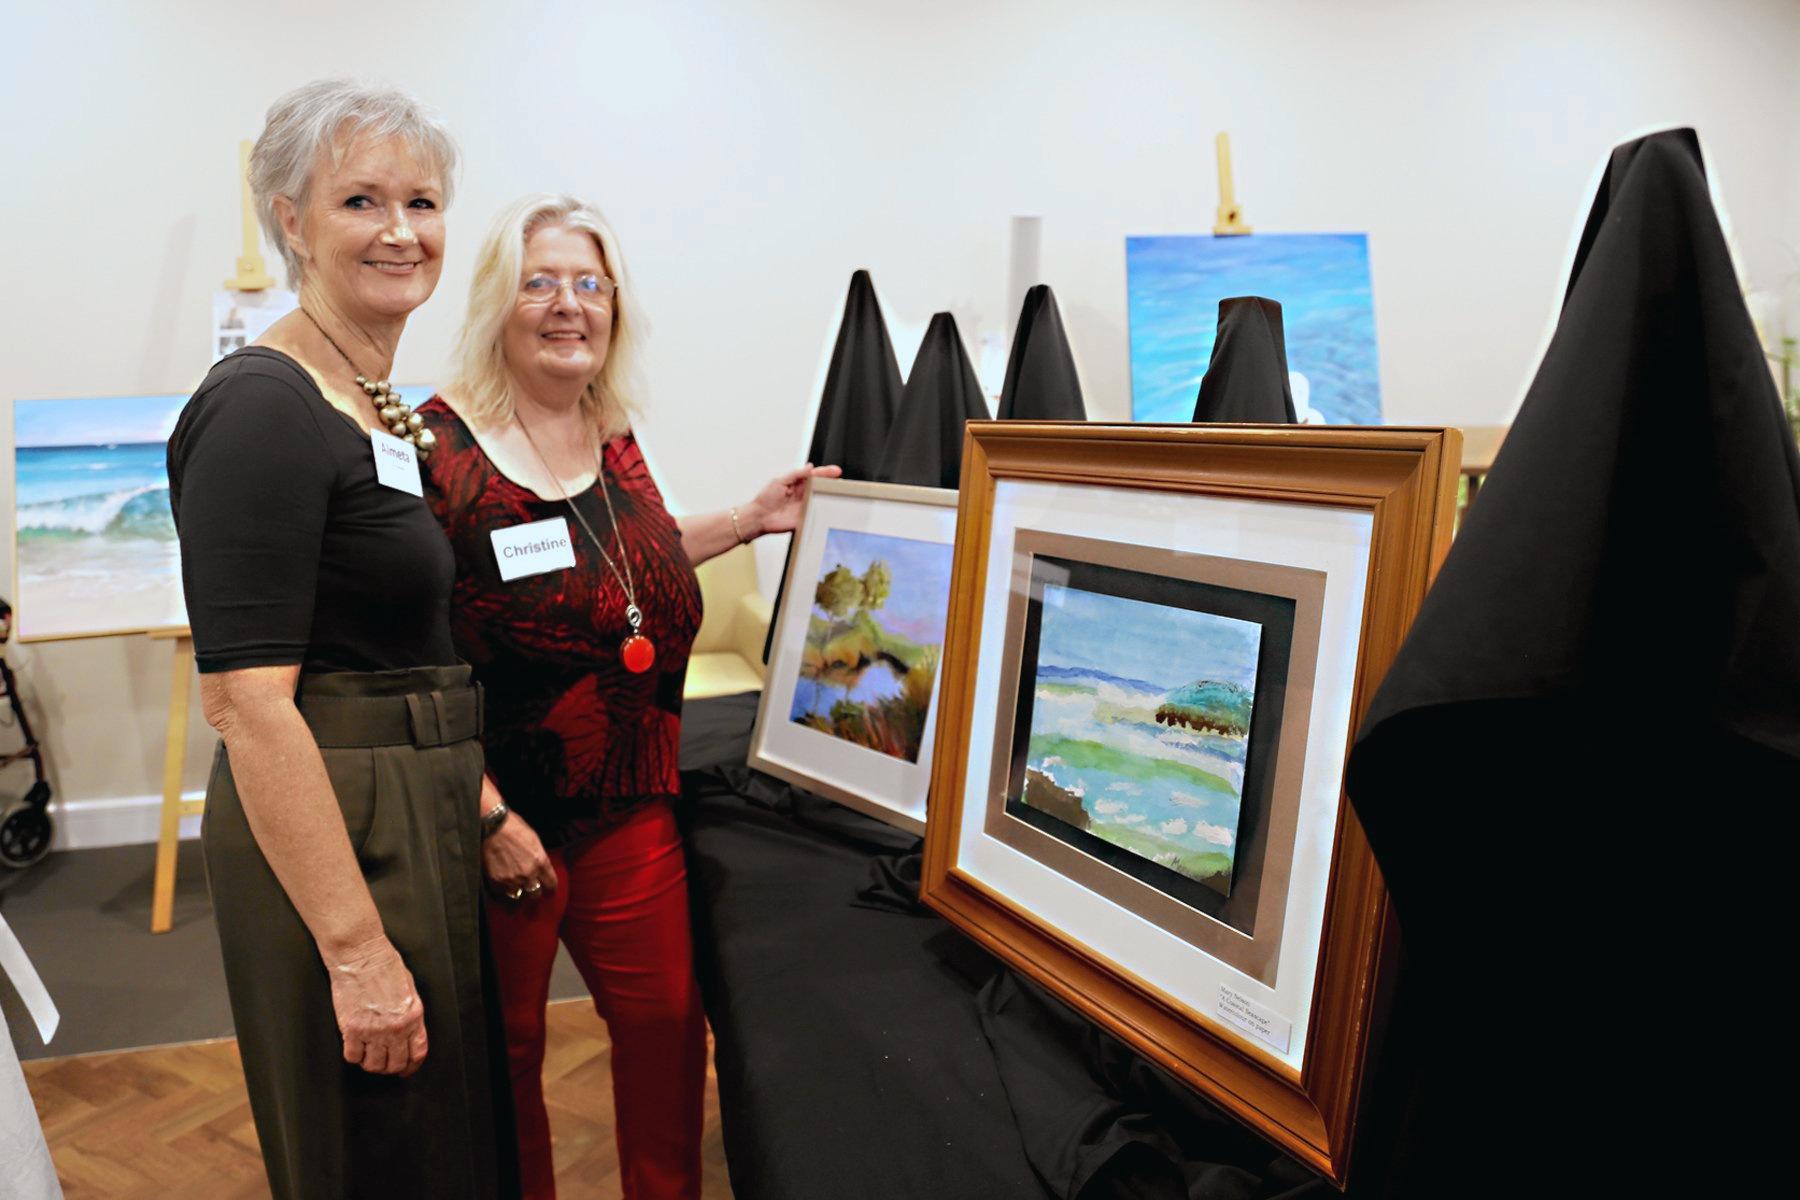 PROUD OF RESIDENTS: Artist and mentor Almeta Lennon (left) and hinterland artist Christine Hopkins peruse the artworks.